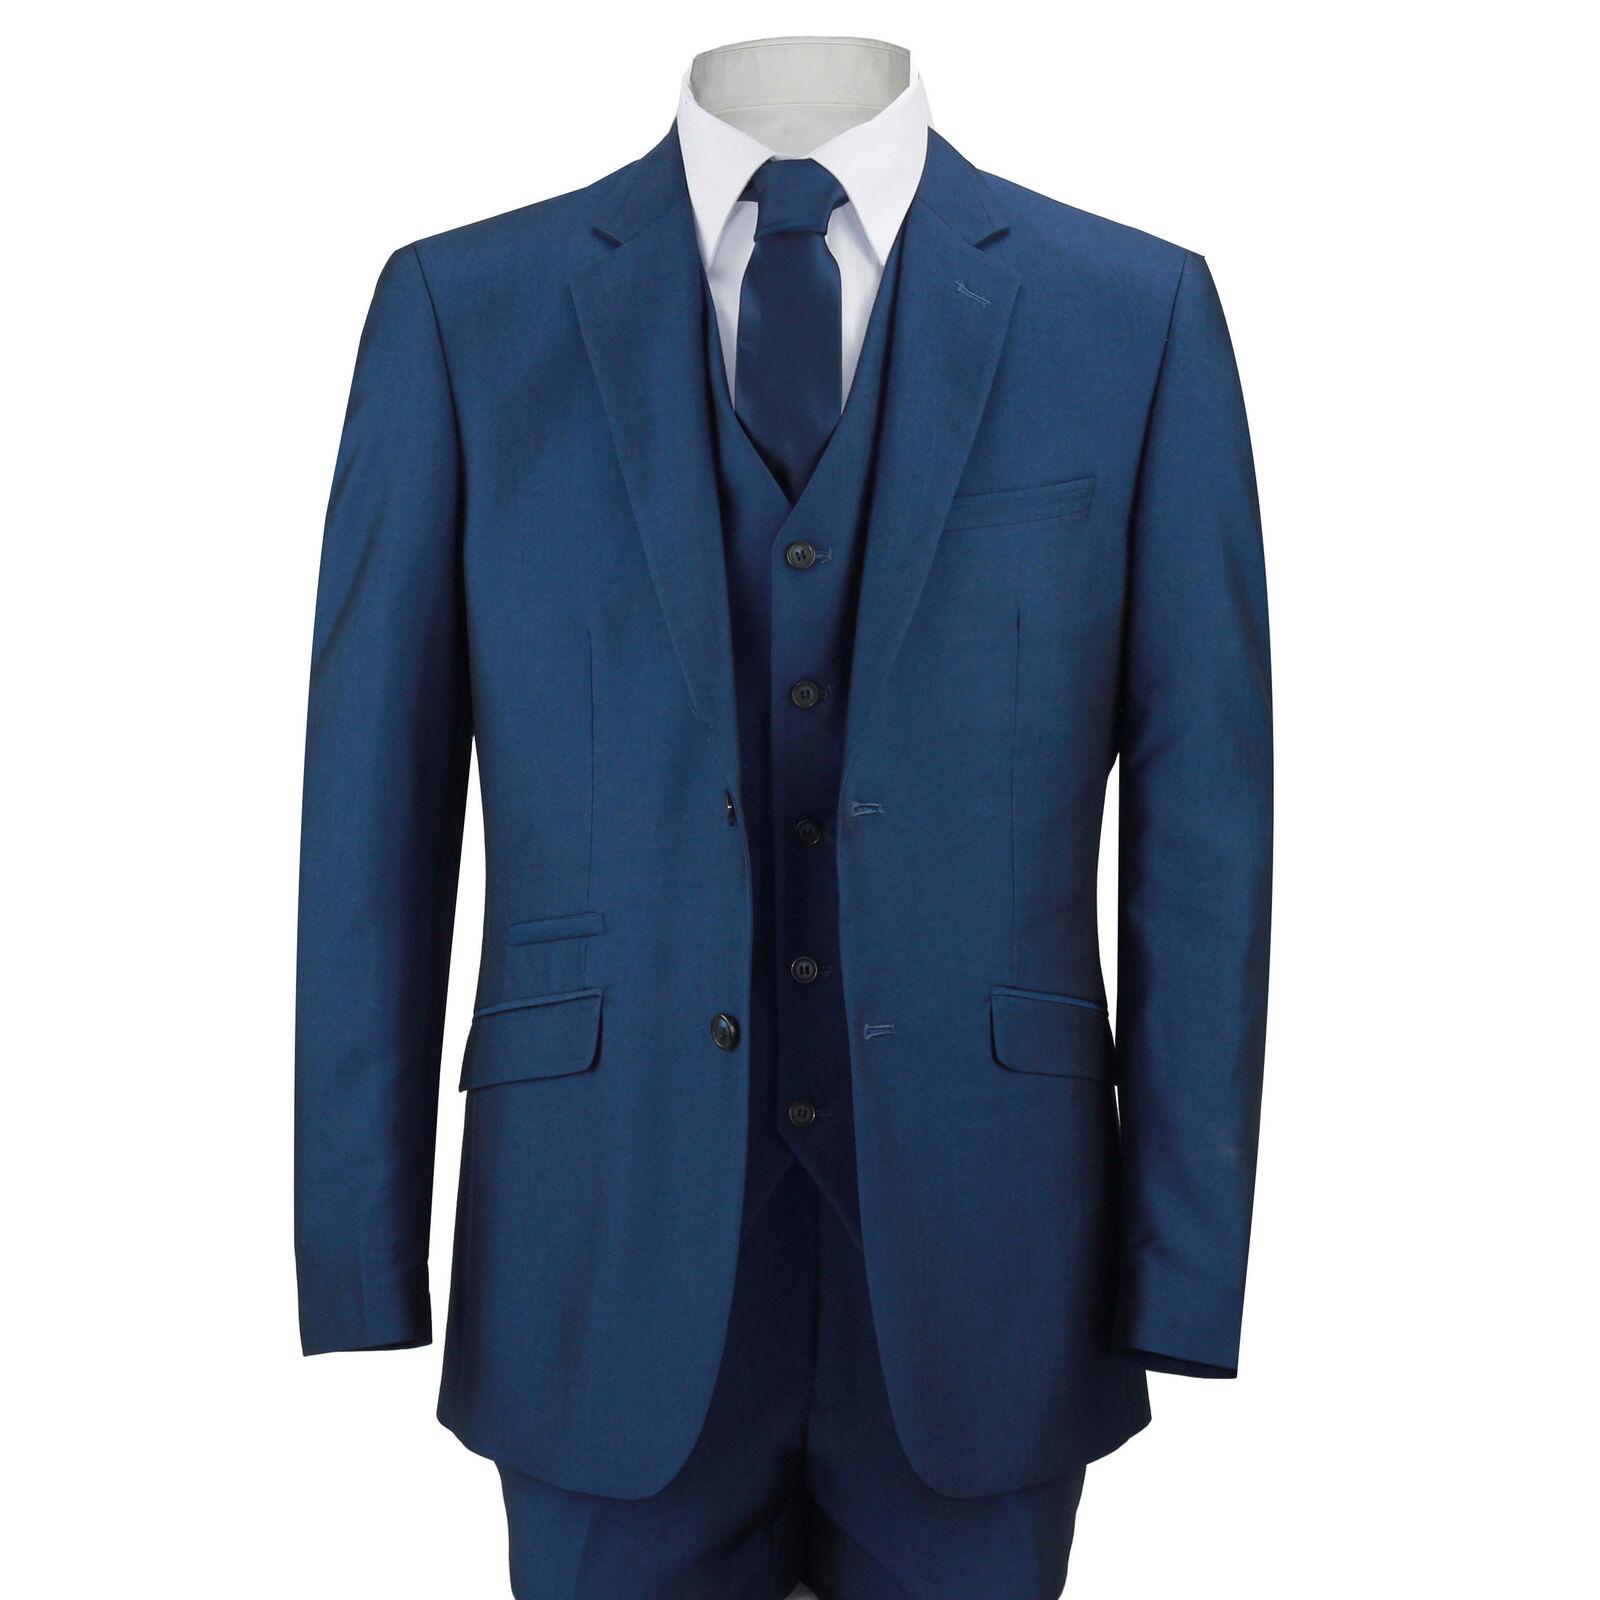 Herren Royal Blau 3 Piece Suit Work Wedding Prom Party Blazer Waistcoat Trousers